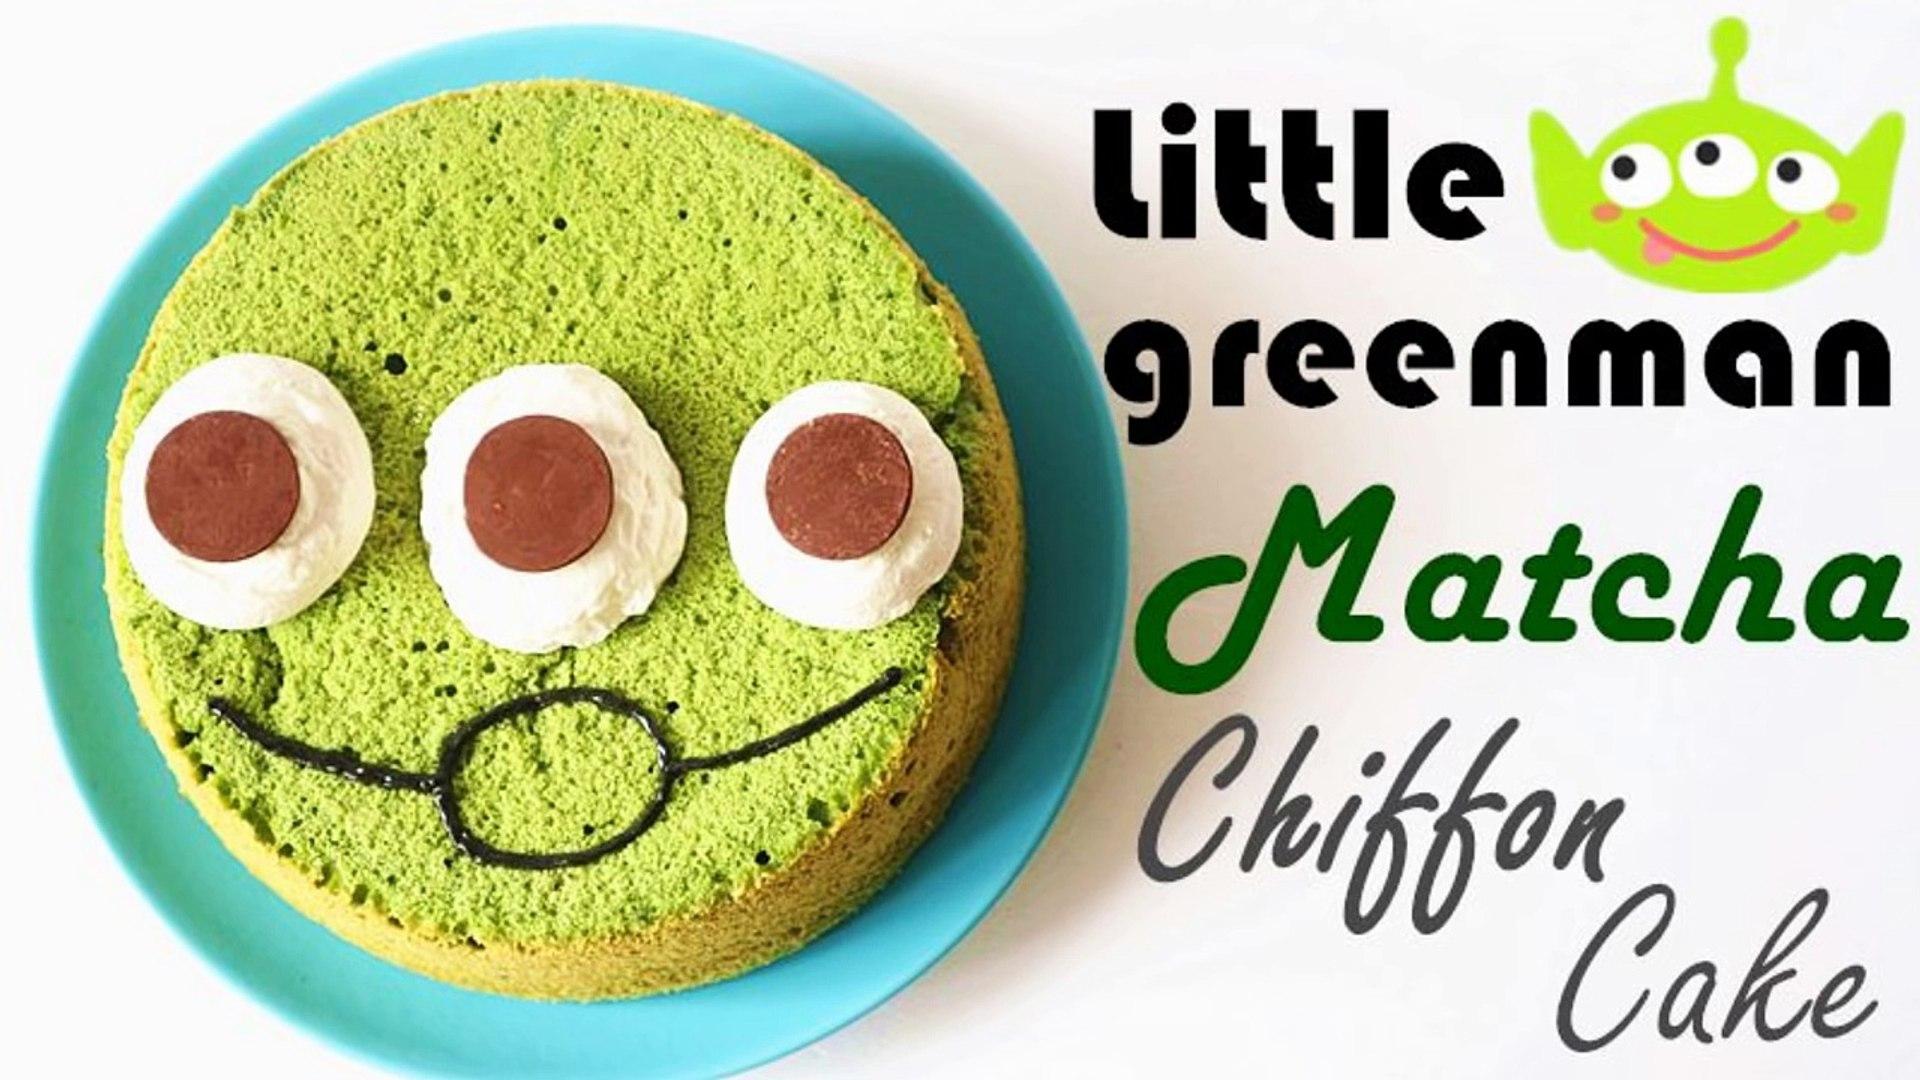 How to make Little Greenman Matcha Chiffon Cake 三眼仔抹茶戚風蛋糕 토이스토리 알린 말차 시폰 케이크 만드는 방법-hBs31UlfI5k